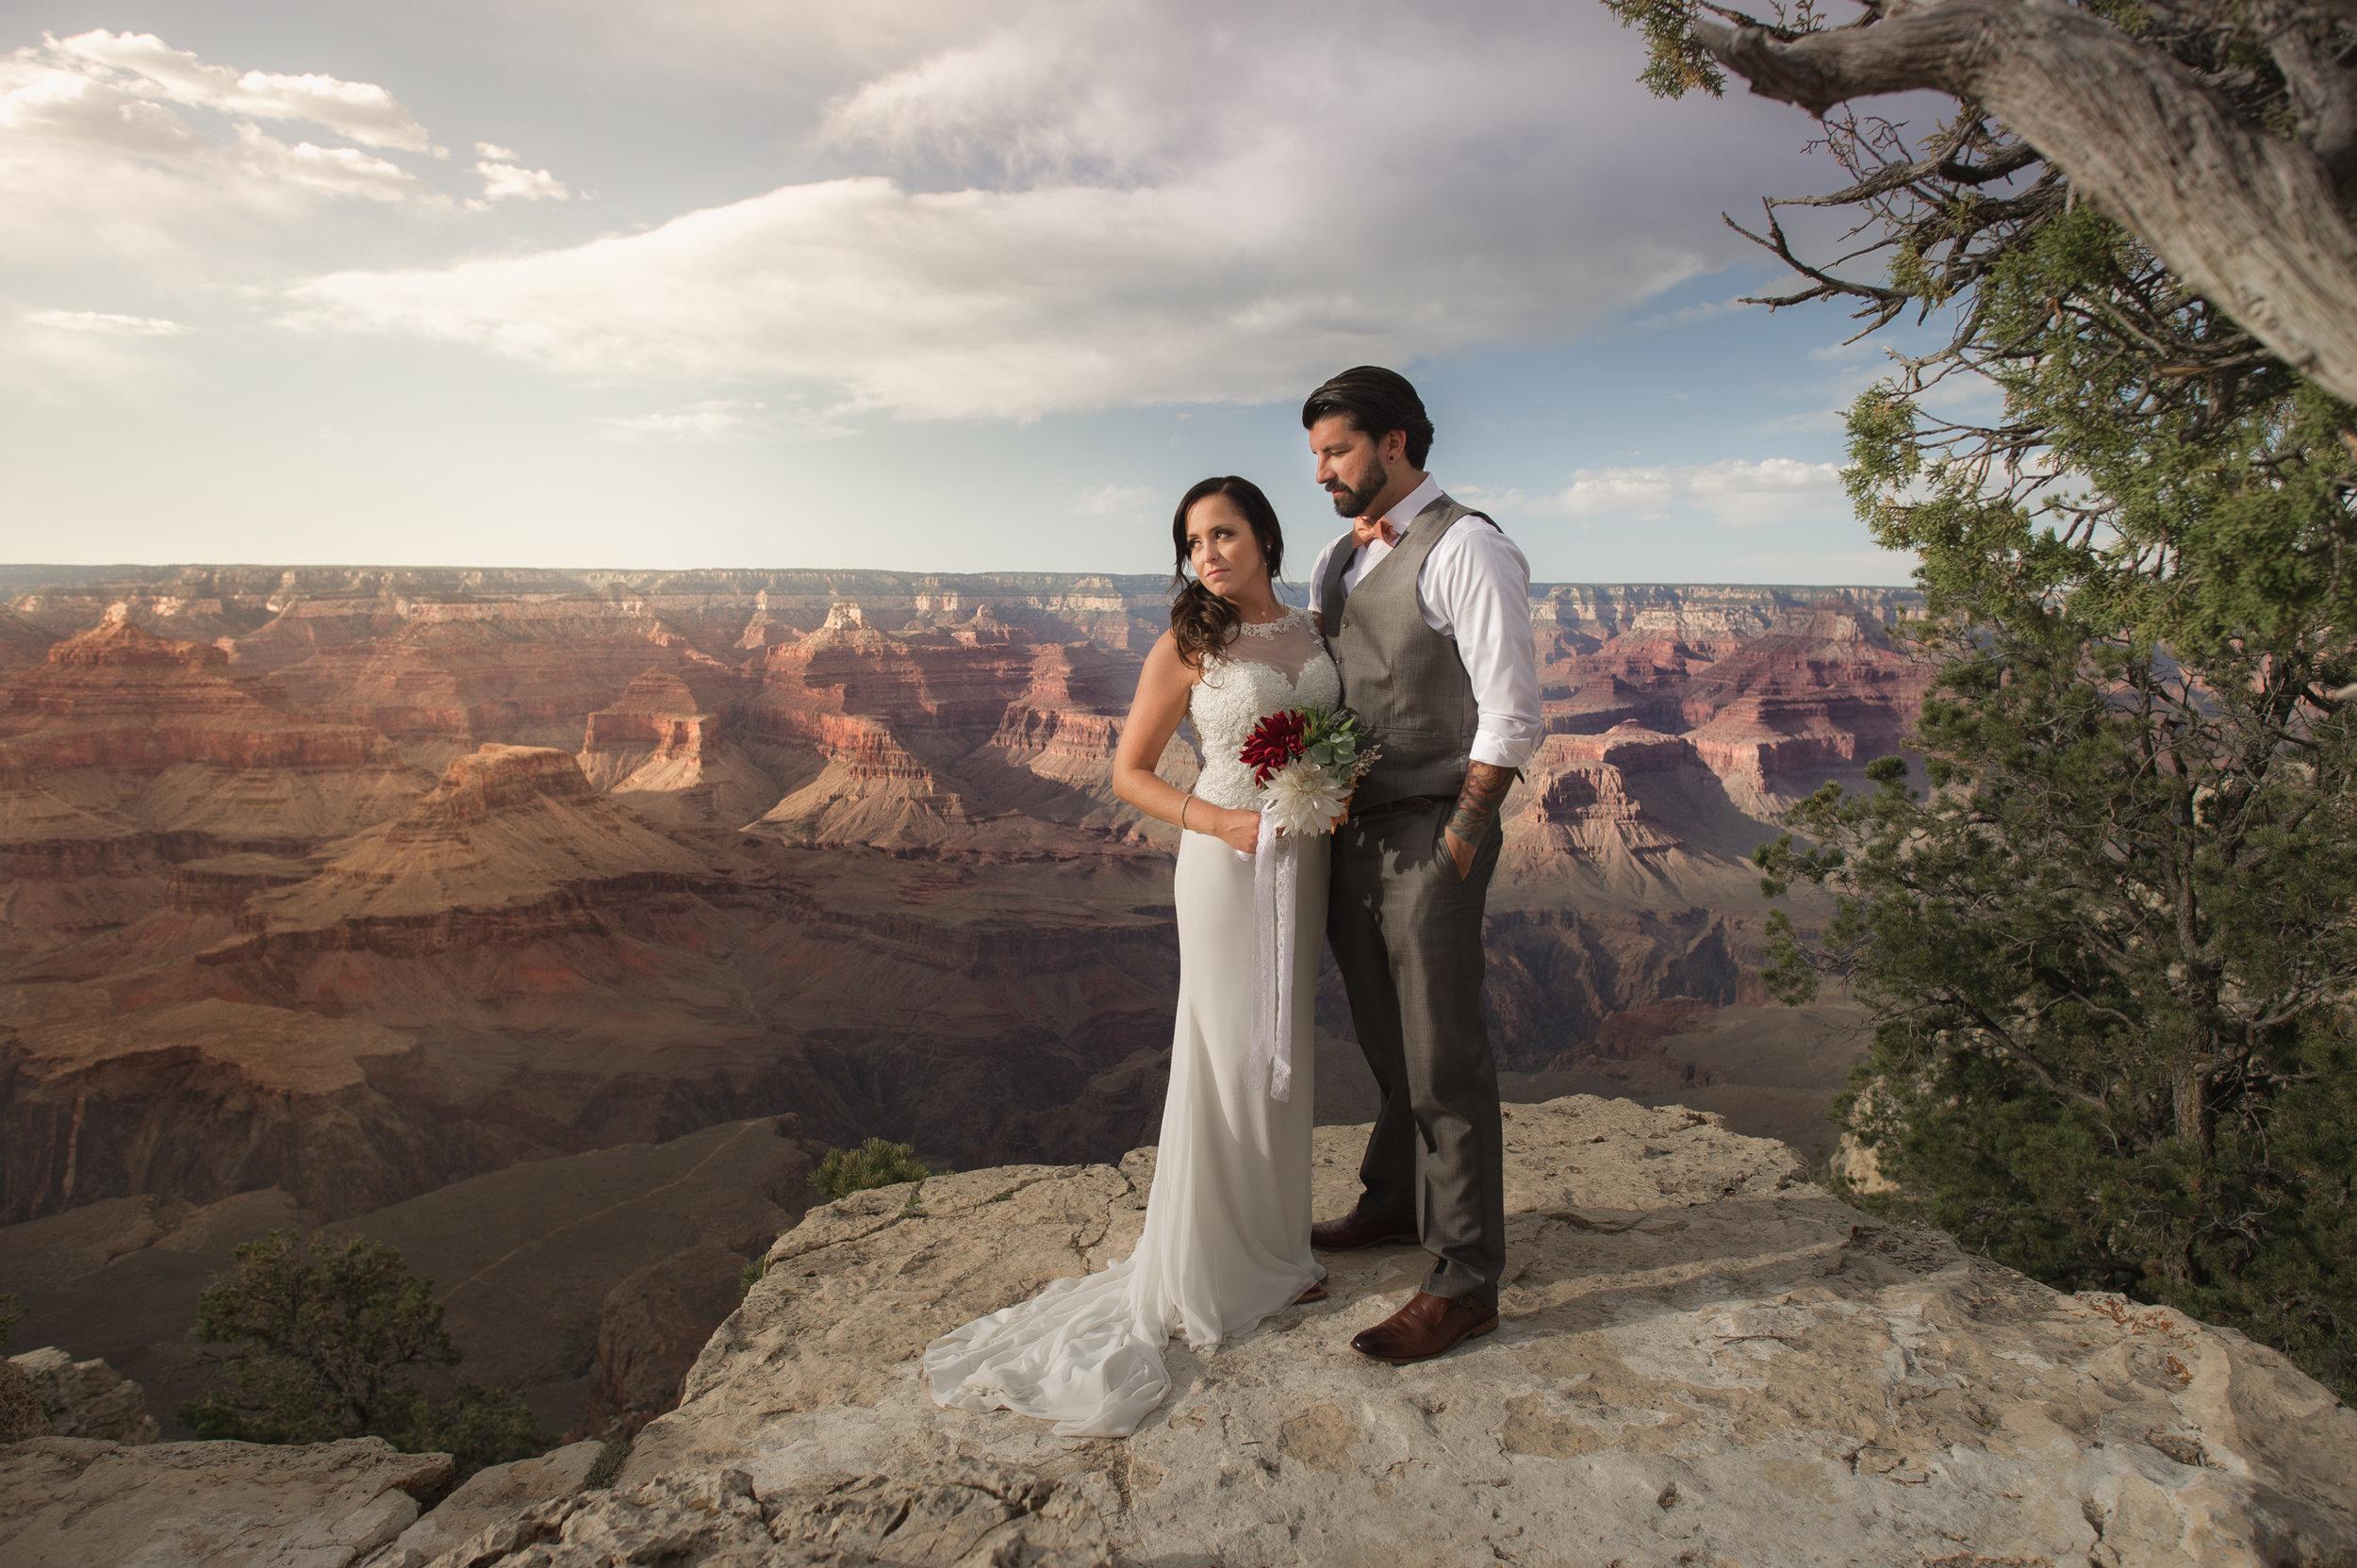 Yavapai Point, South Rim of the Grand Canyon - Arizona